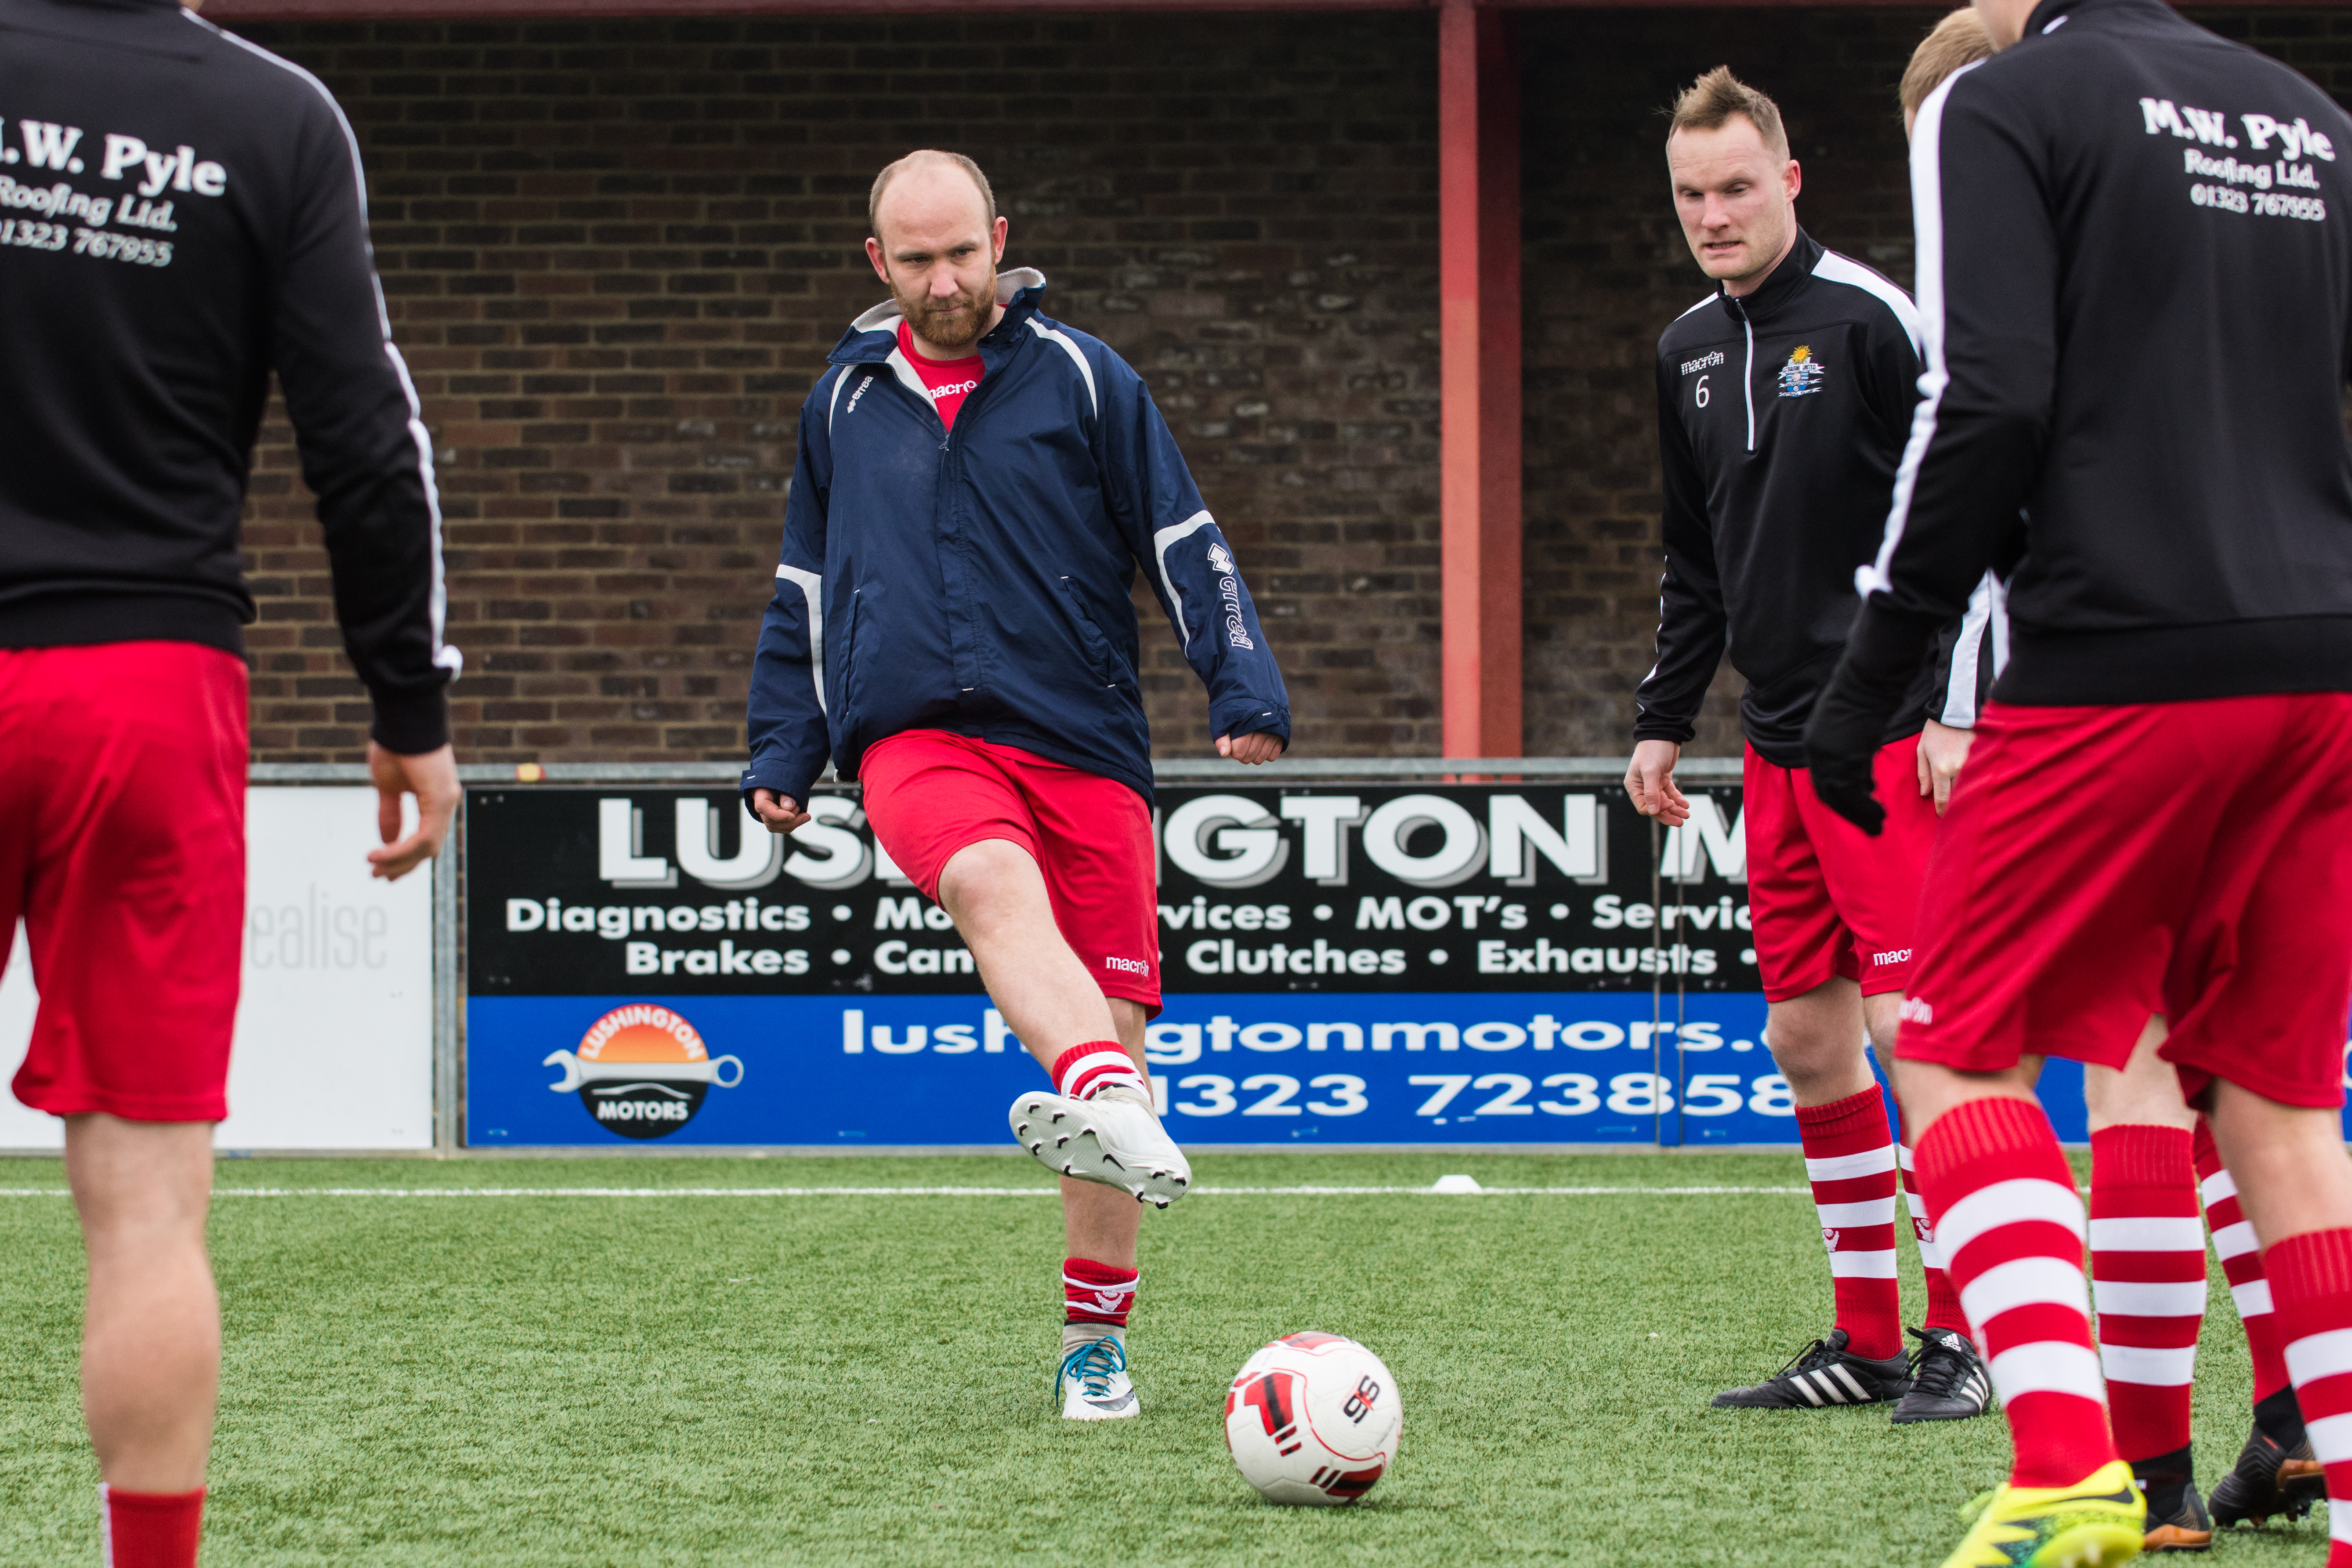 DAVID_JEFFERY Langney Wanderers FC vs Bexhill United FC 03.03.18 09